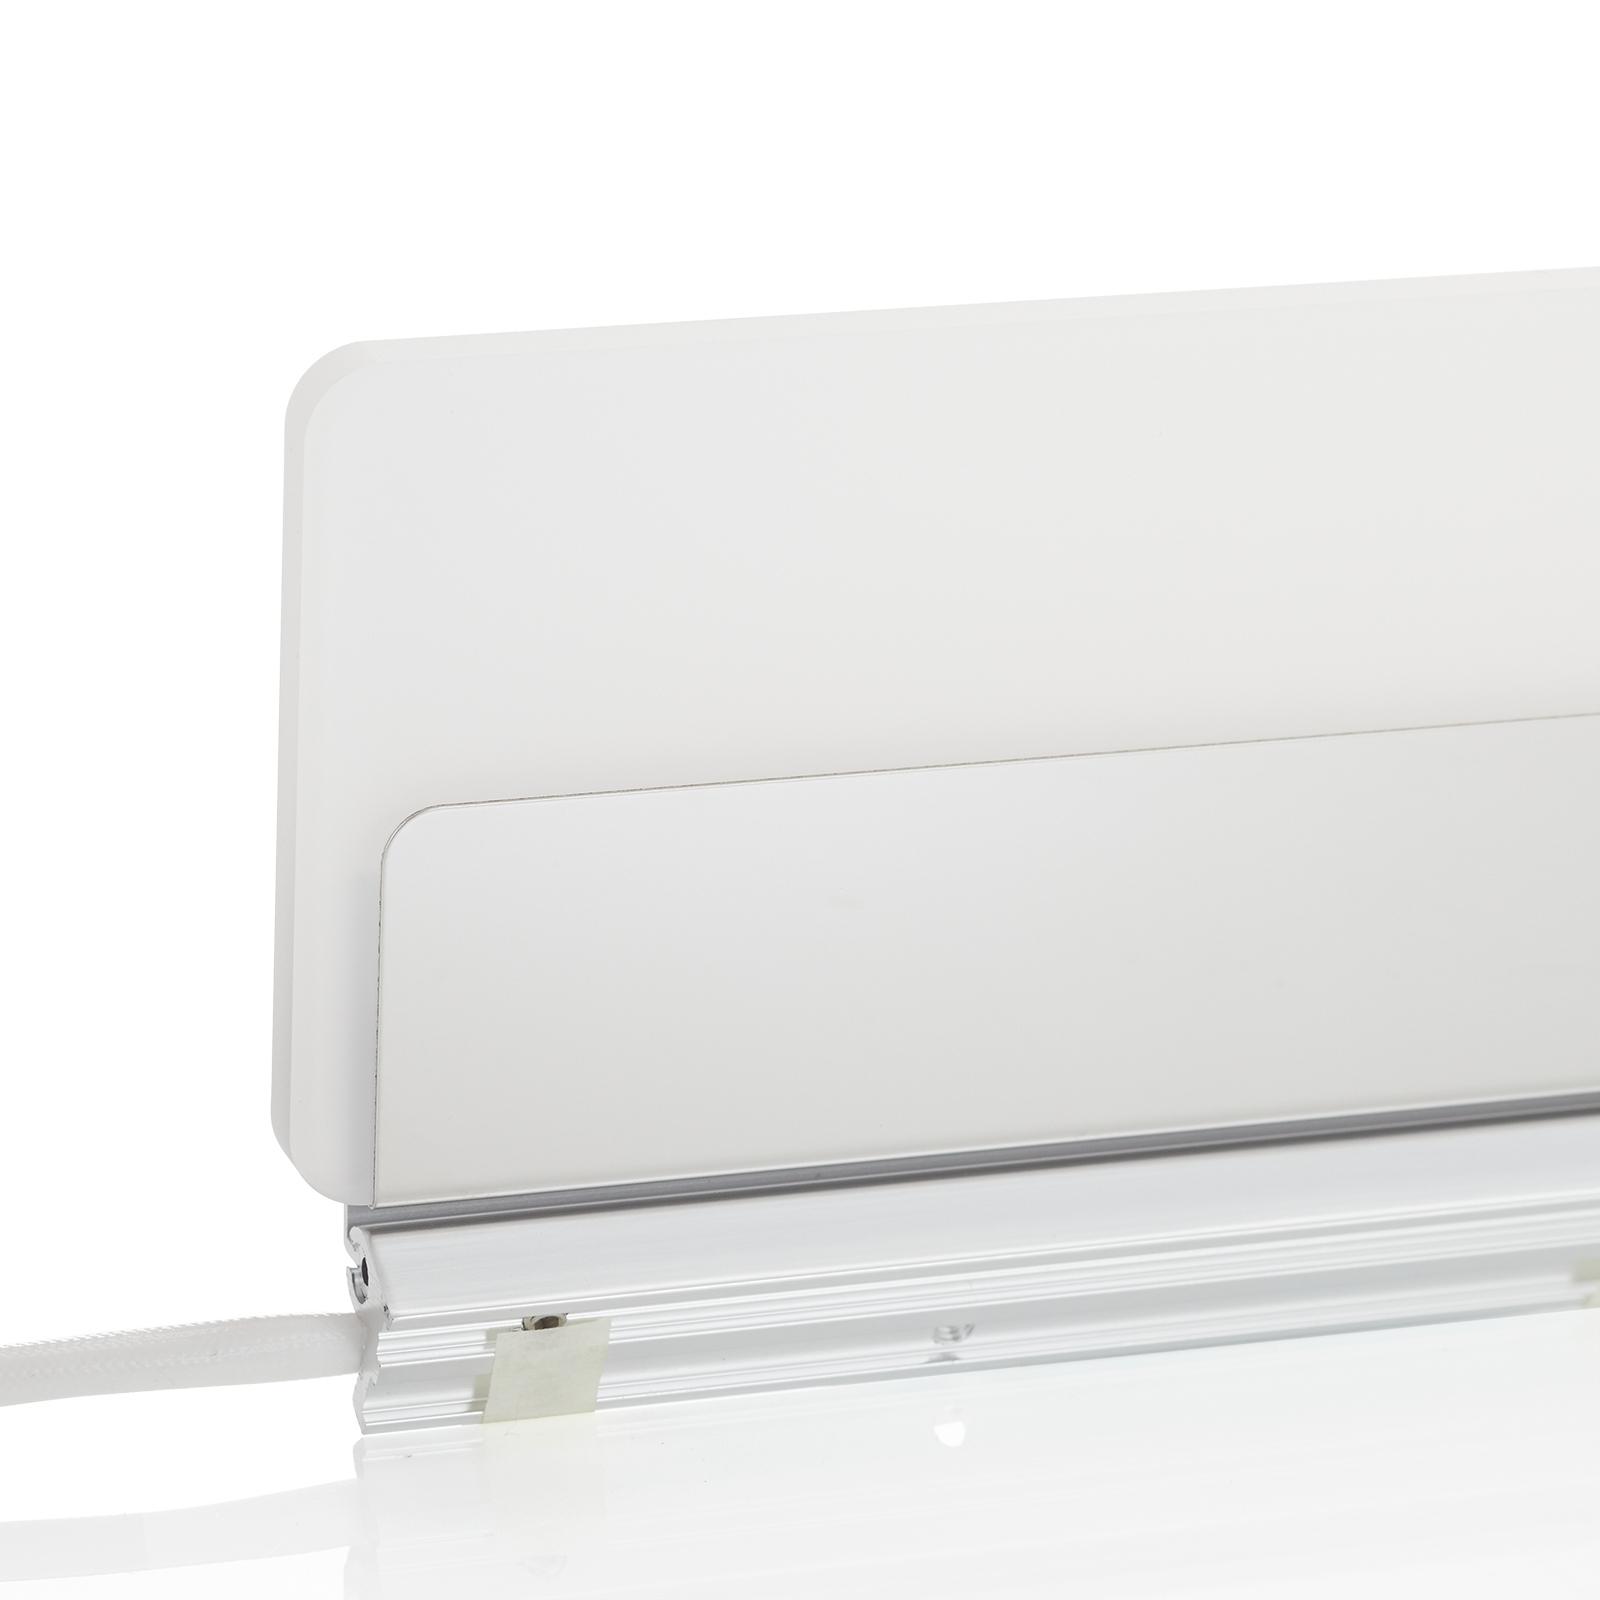 30 cm lange LED-Spiegelleuchte Katherine S2, IP44